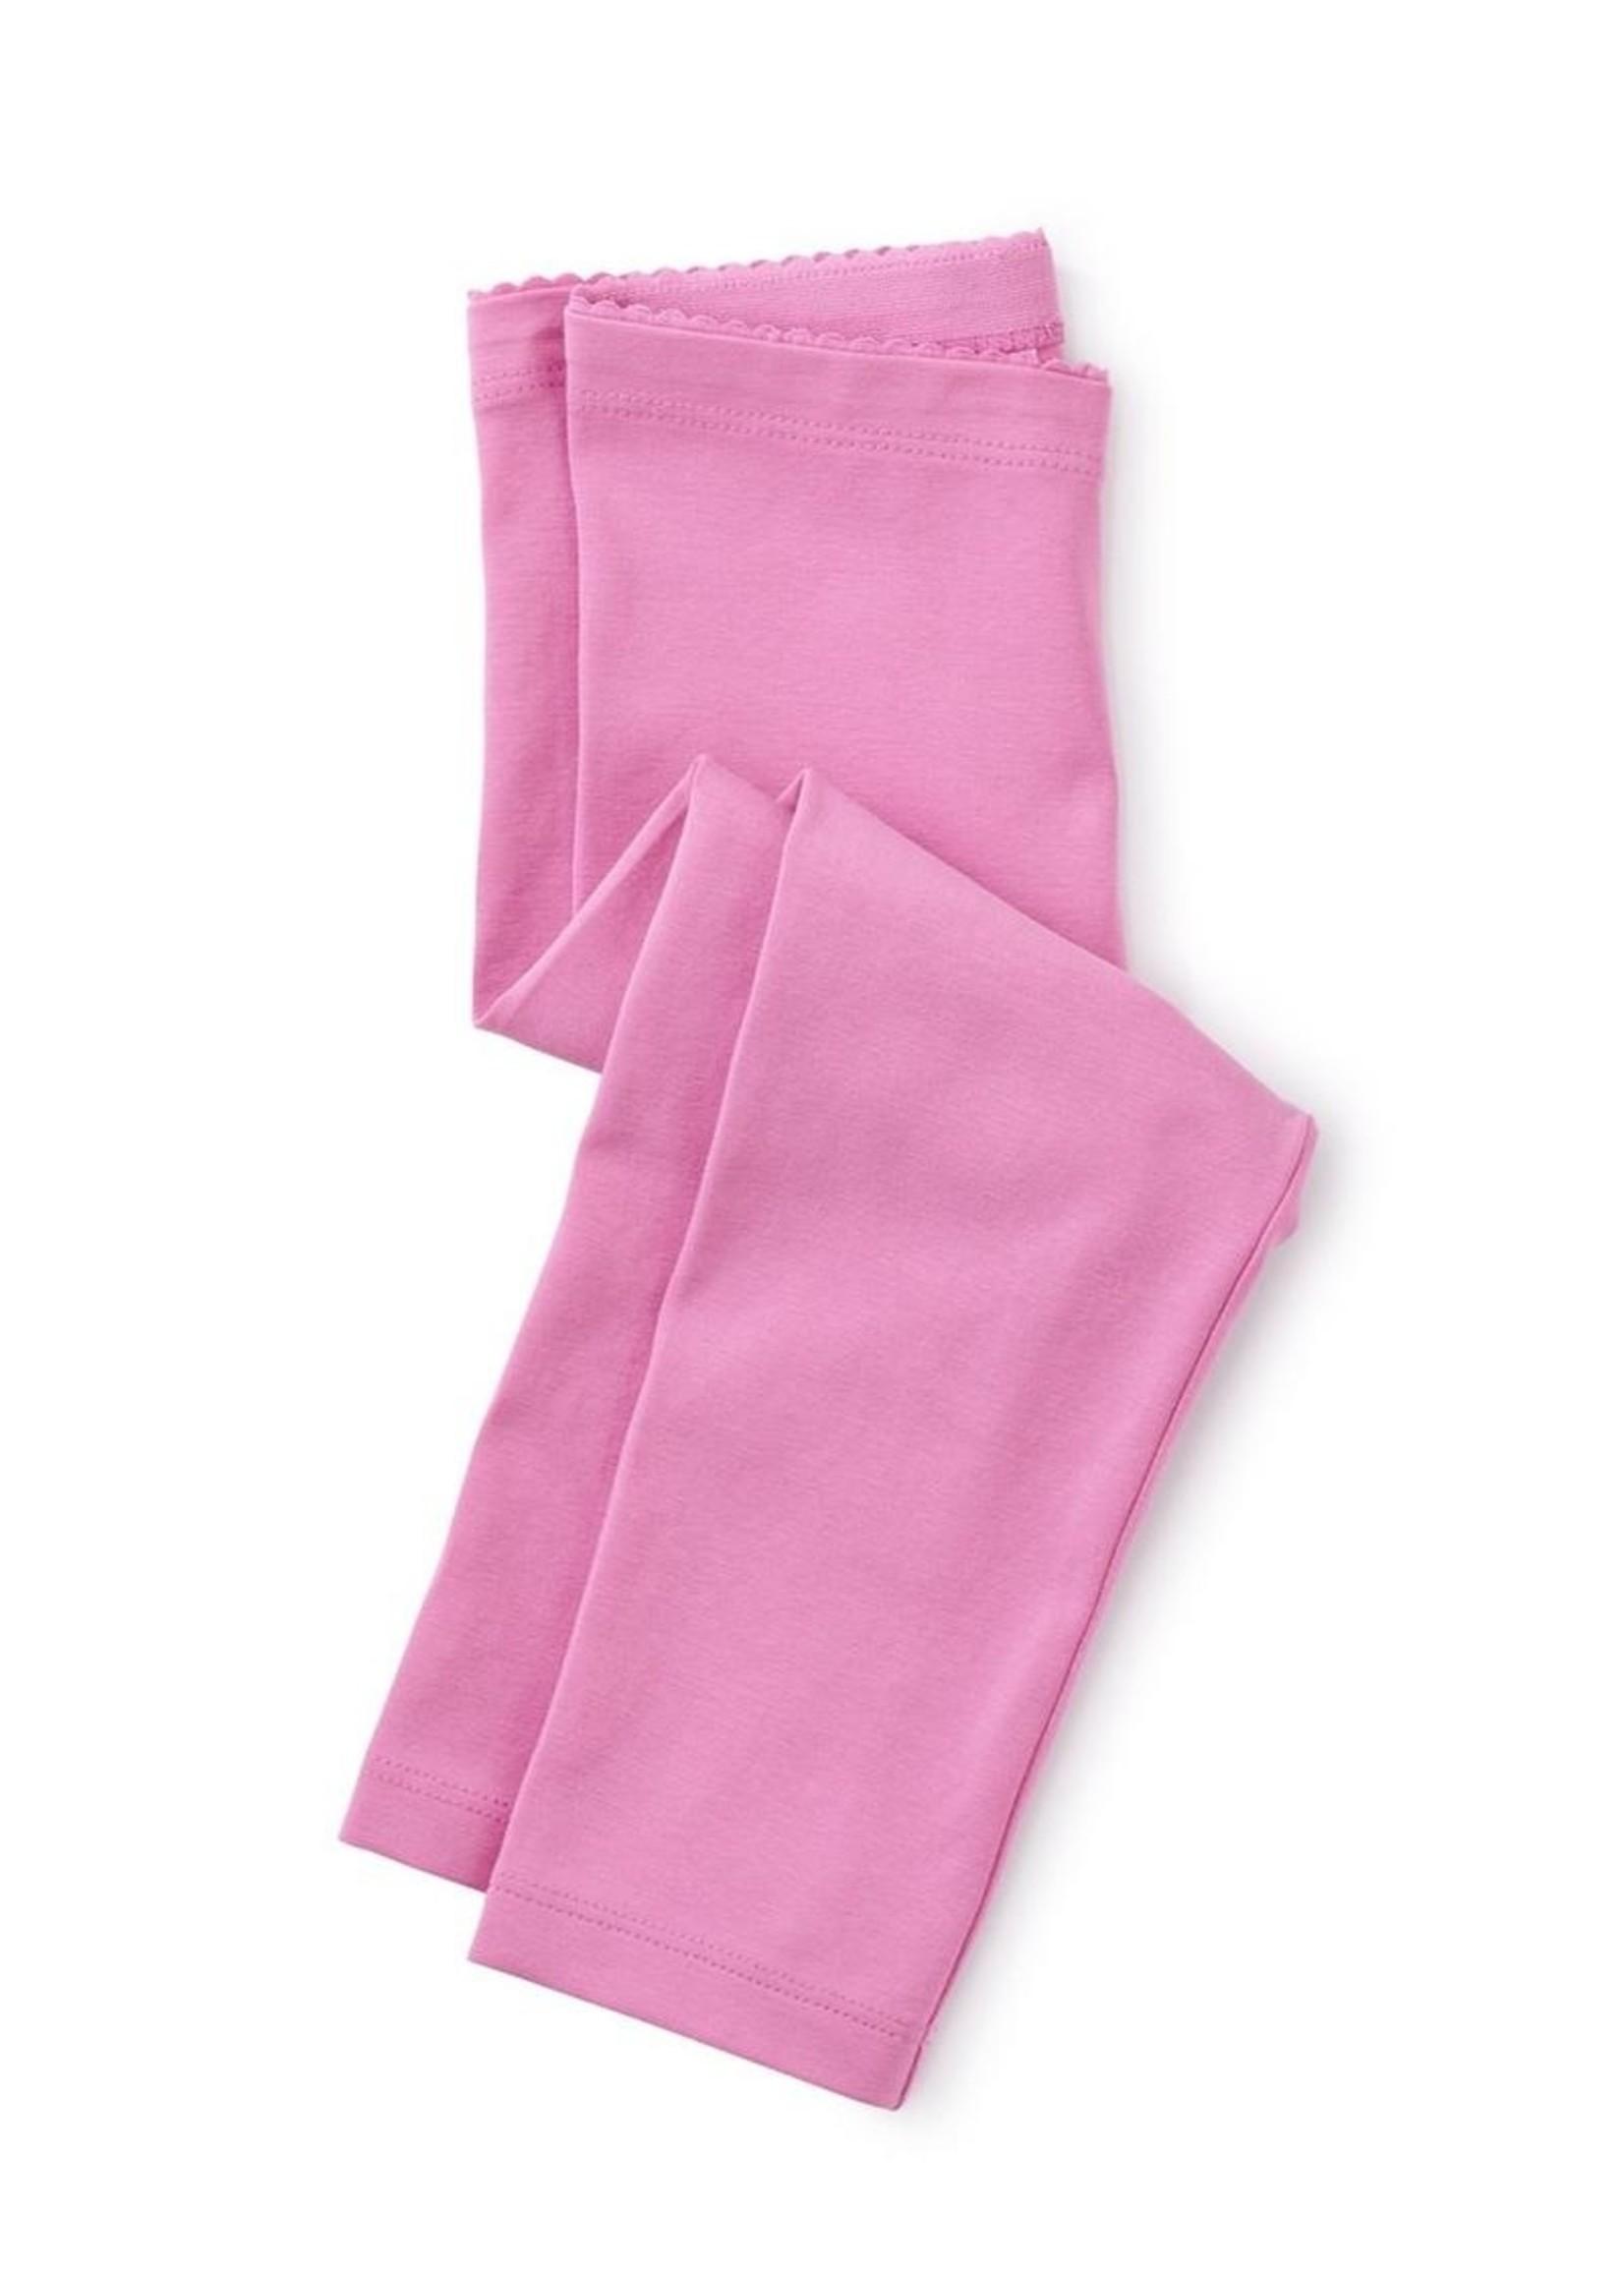 Tea Collection Perennial Pink Solid Capri Leggings